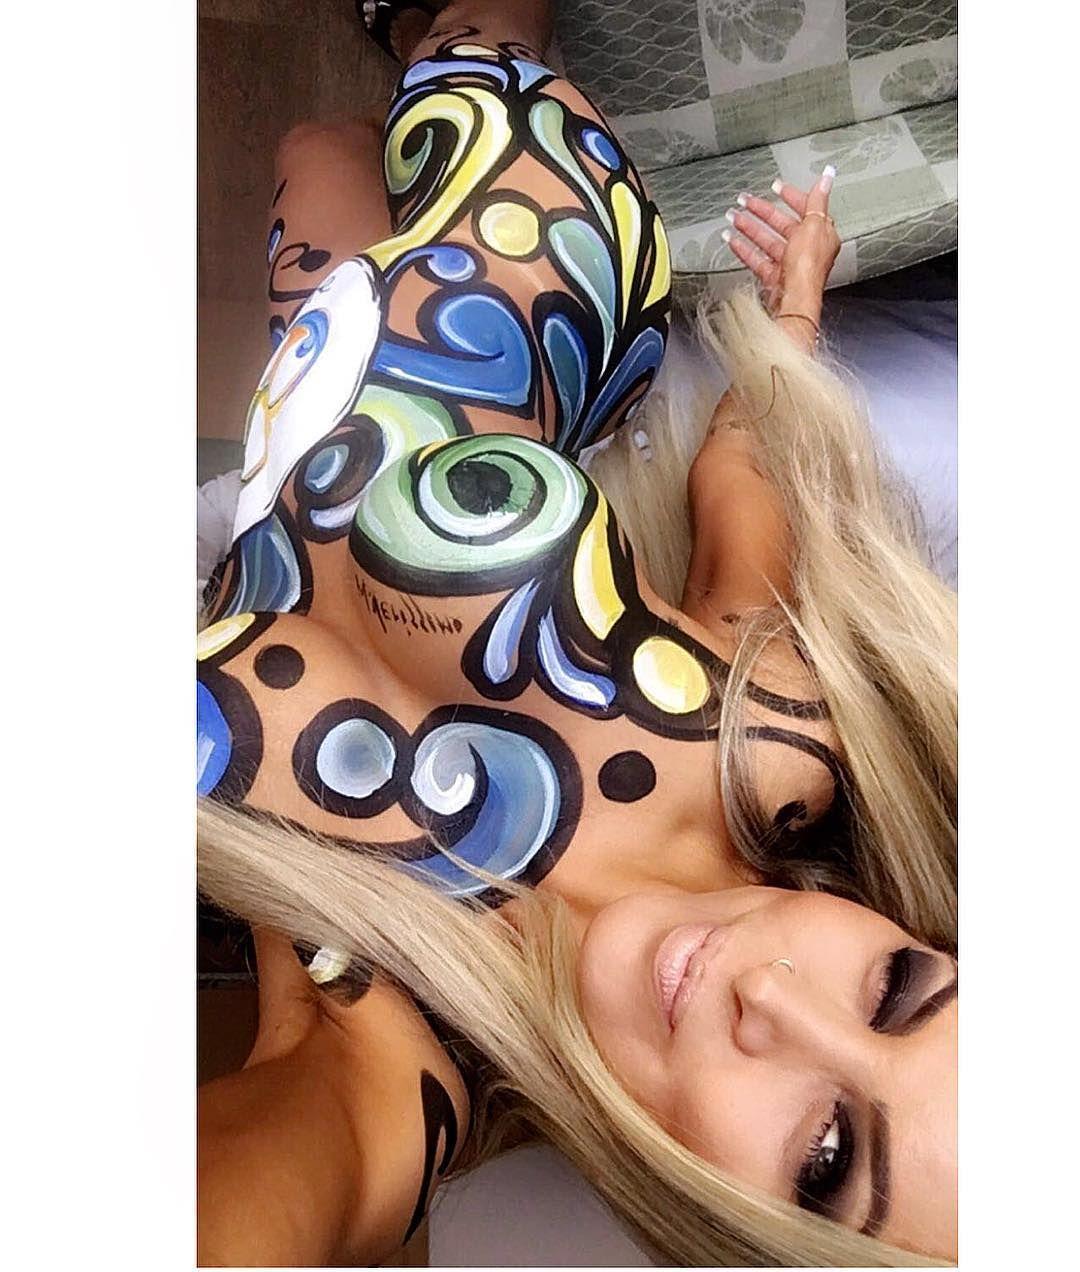 Dayse Brucieri Blogueira E Mamãe Fitness FitnessGirls 2016 Assessoria Vanessa Haddad @vhassessoria Parcerias direct Snapchat dayseizquierdo